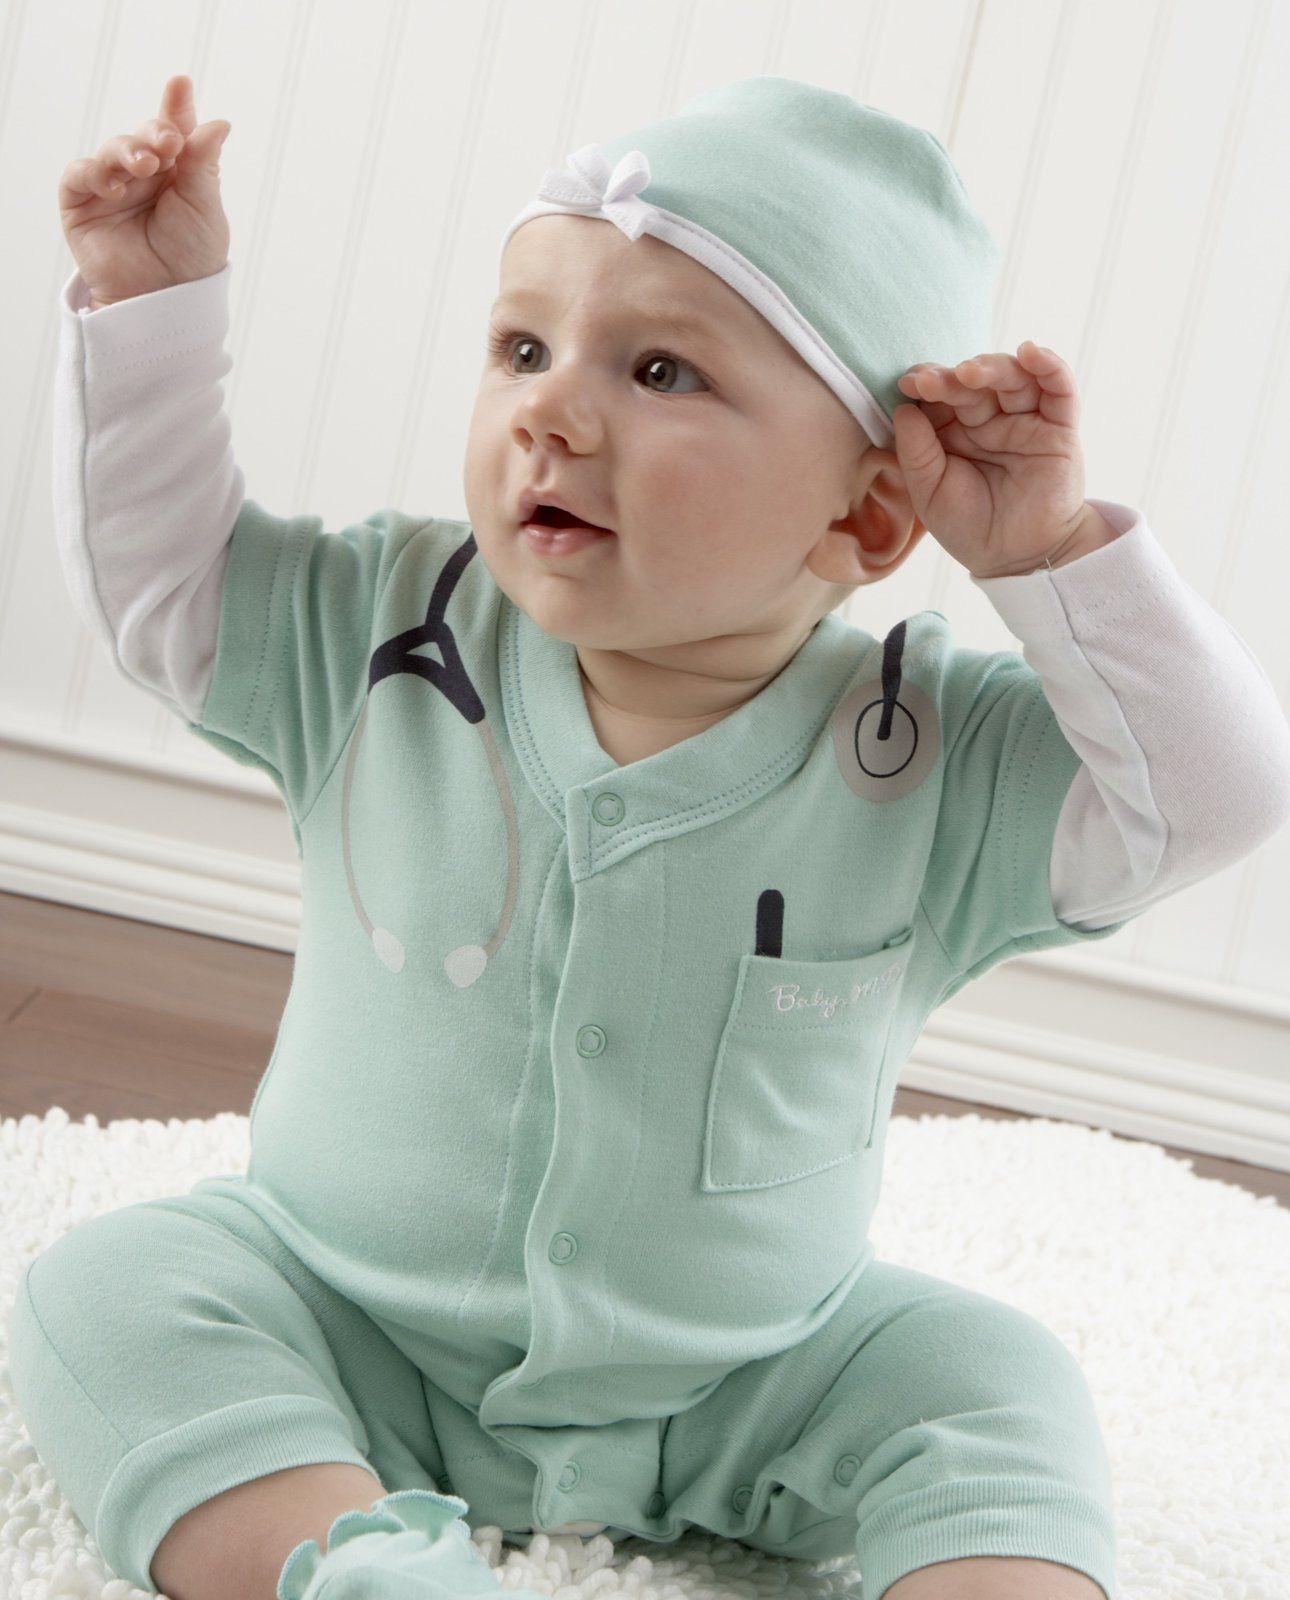 Calling all newborn medical professionals, STAT! Baby Aspen ...